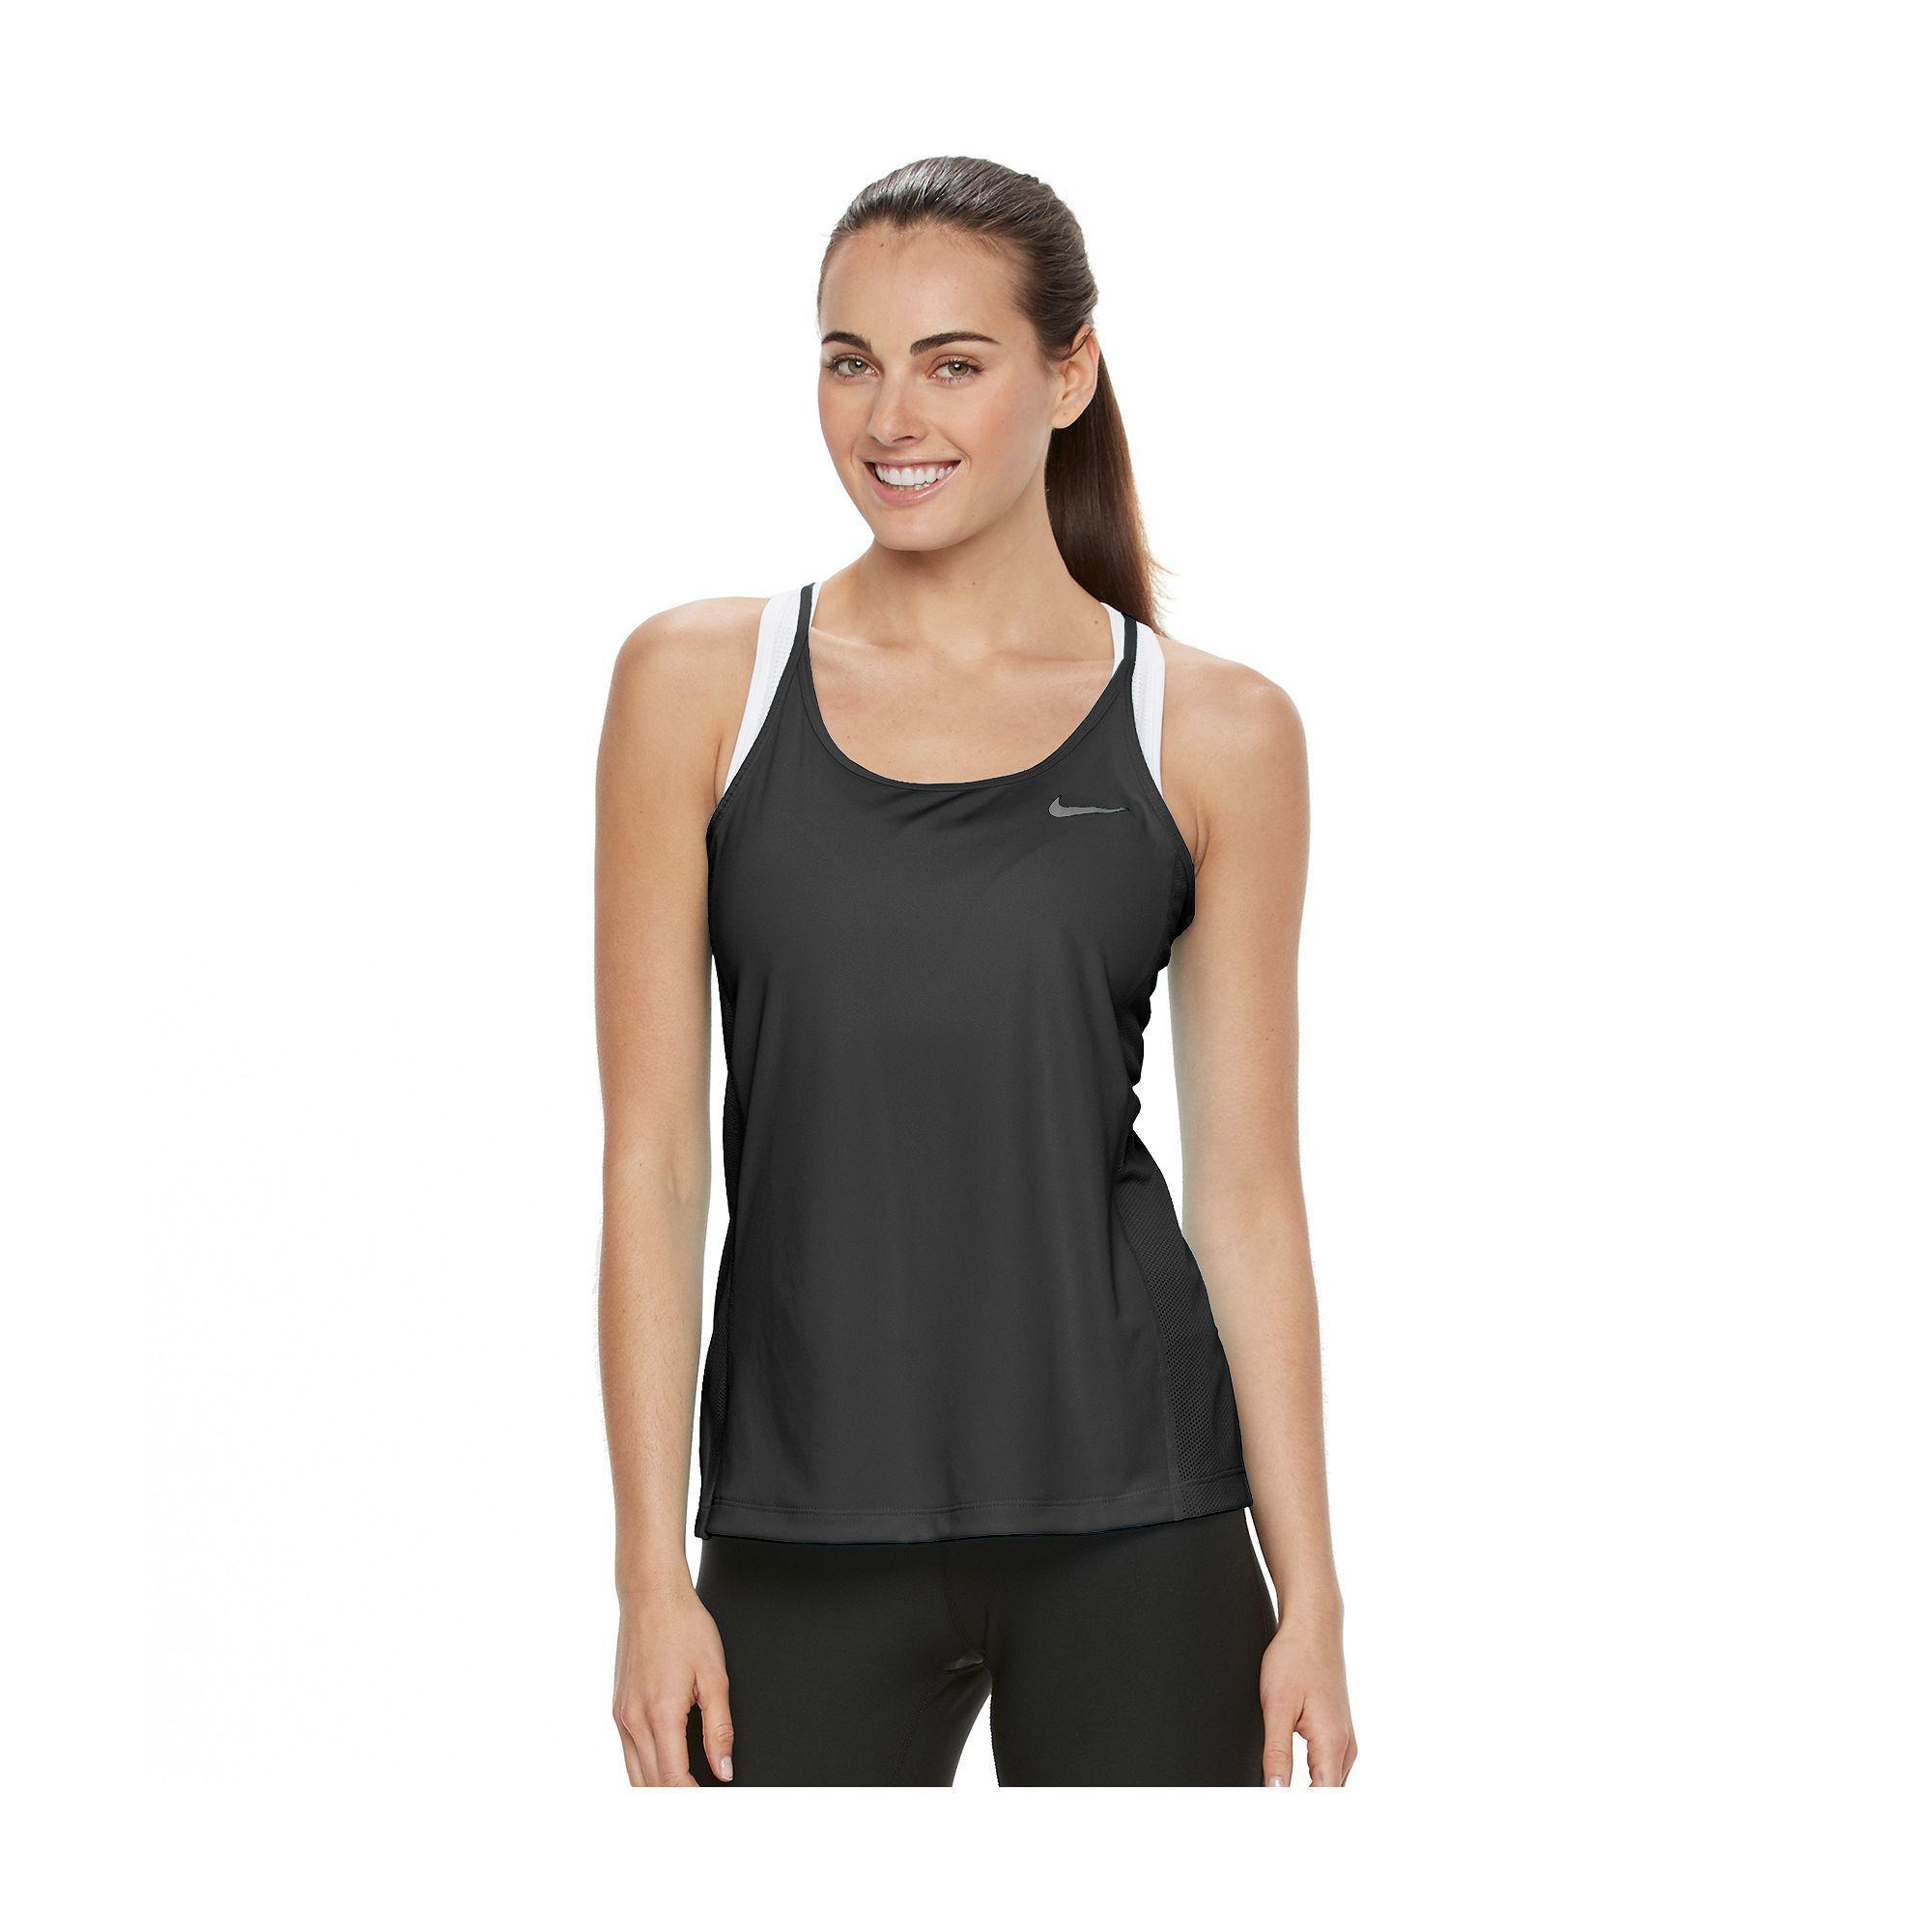 Women's Nike DriFIT Mesh Racerback Tank Top Racerback